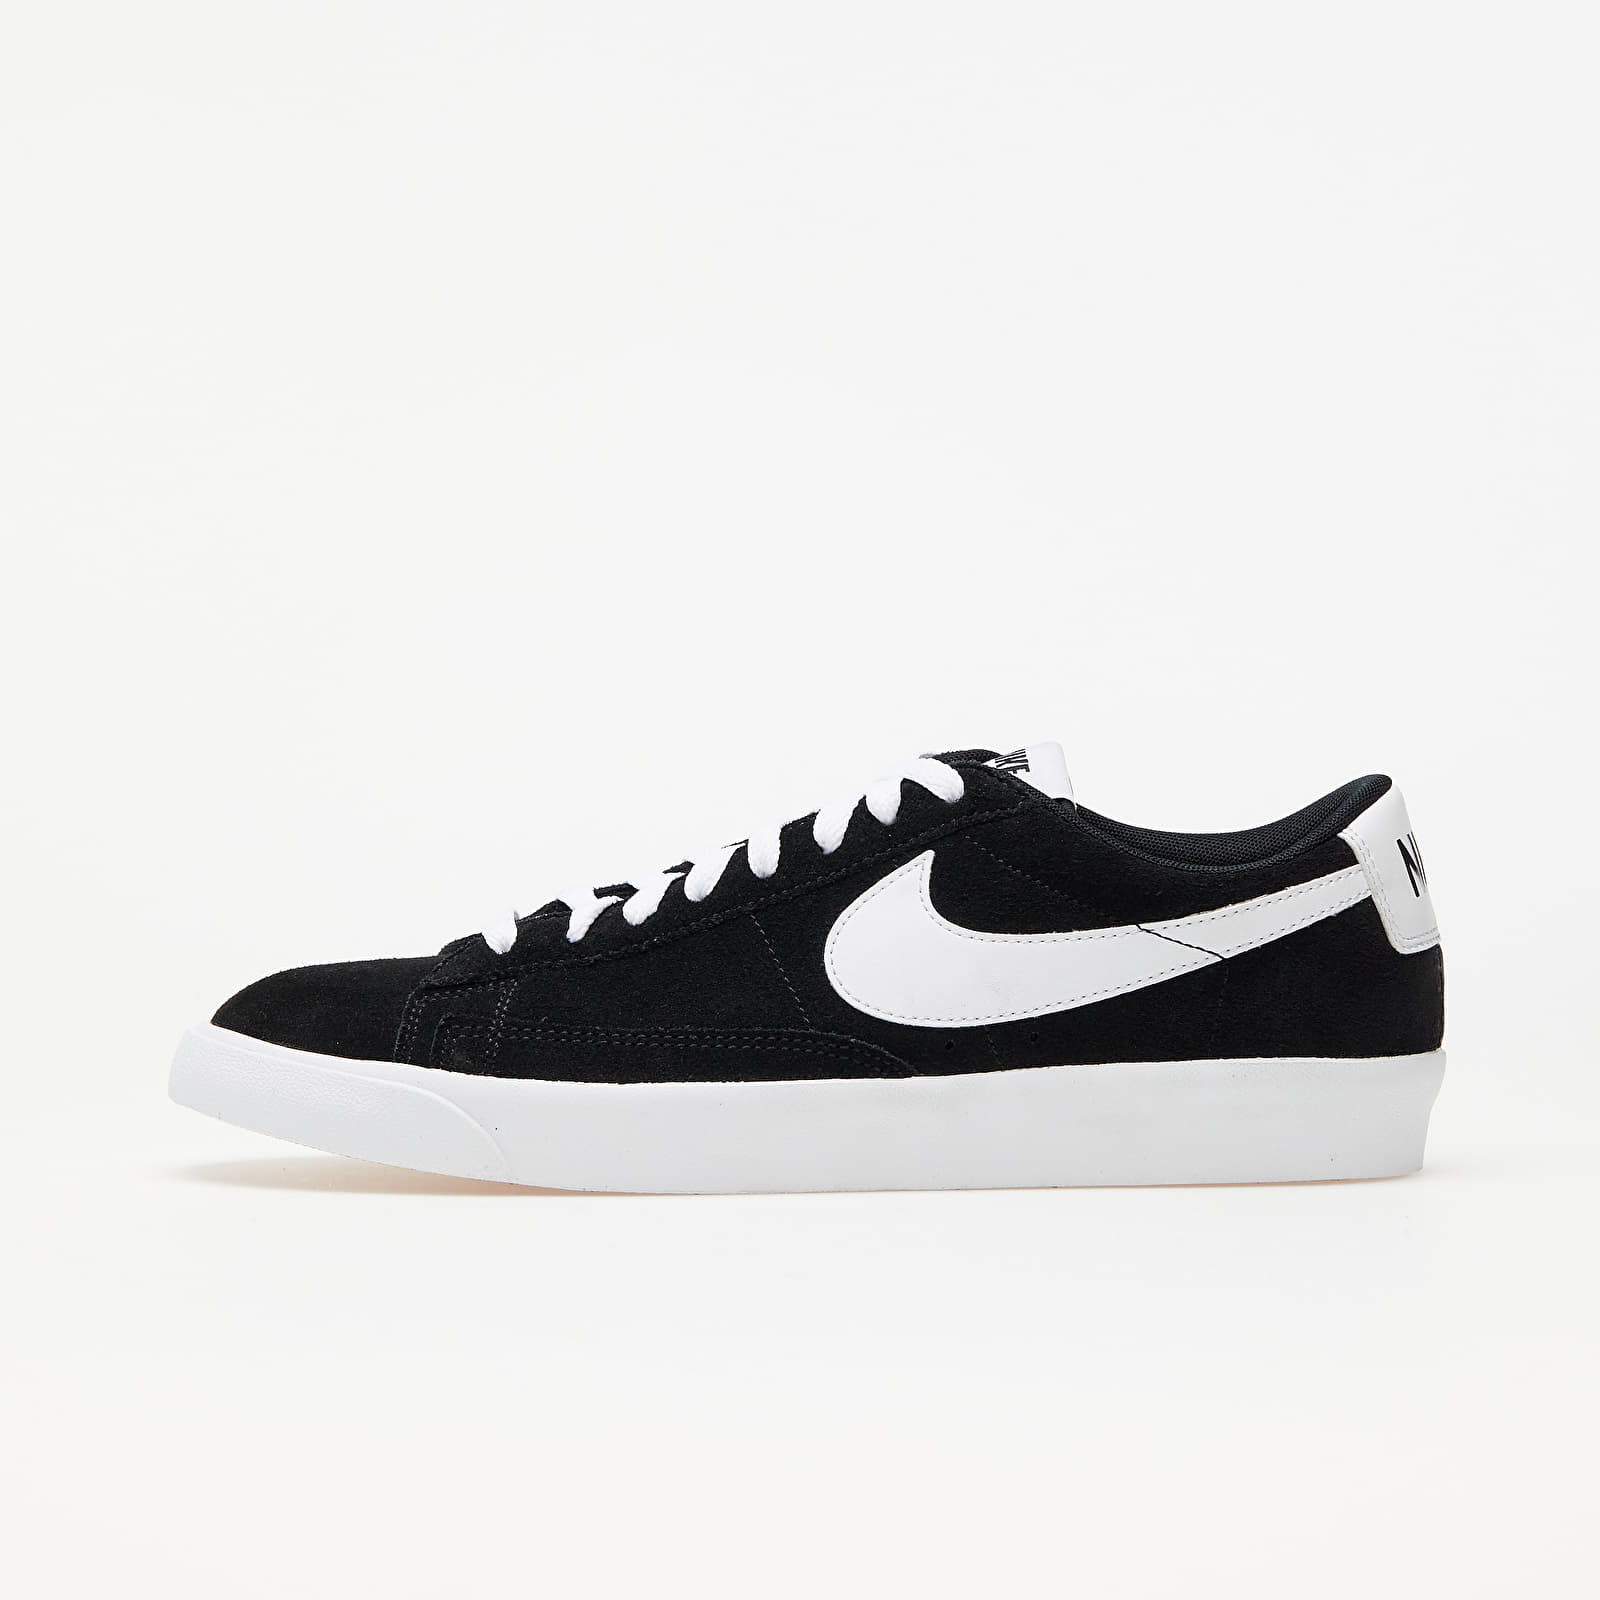 Nike Blazer Low Premium Vntg Suede Black/ White EUR 44